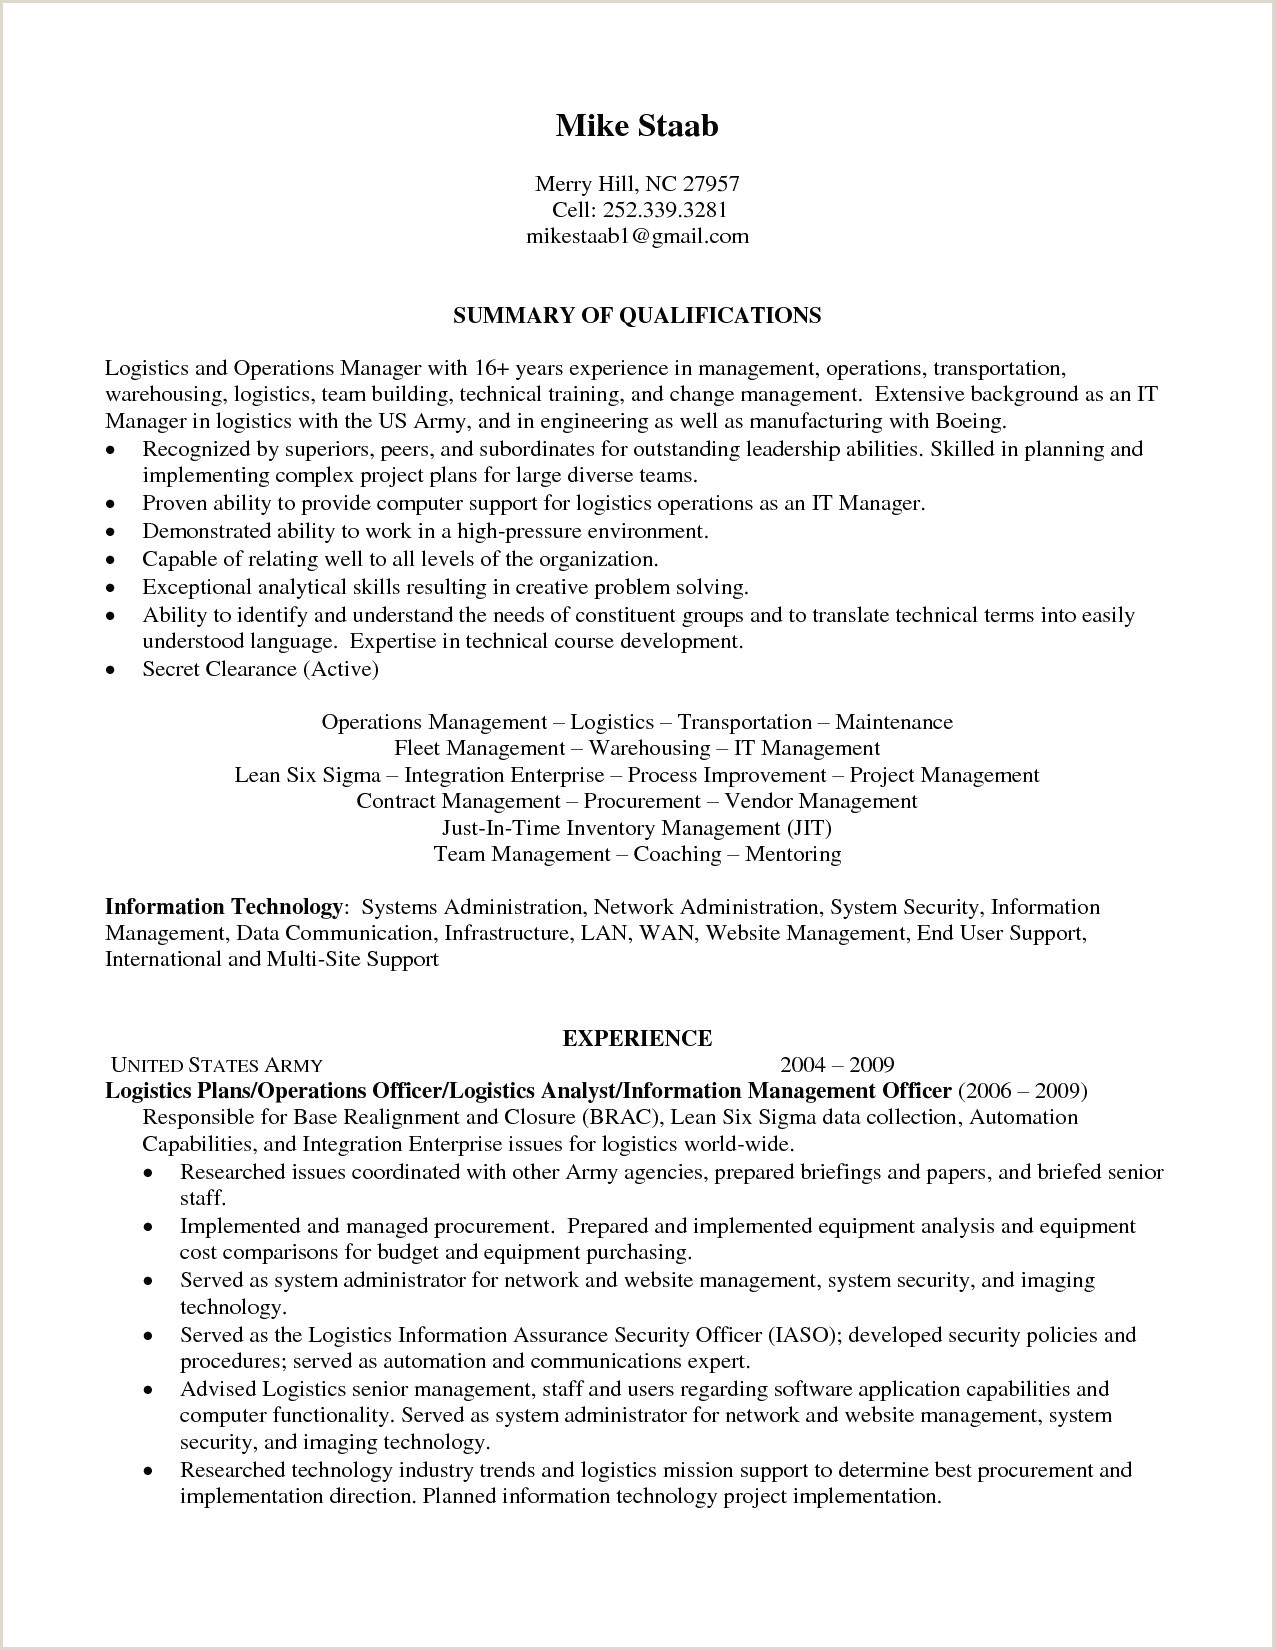 Network Administrator Resume – Kizi games